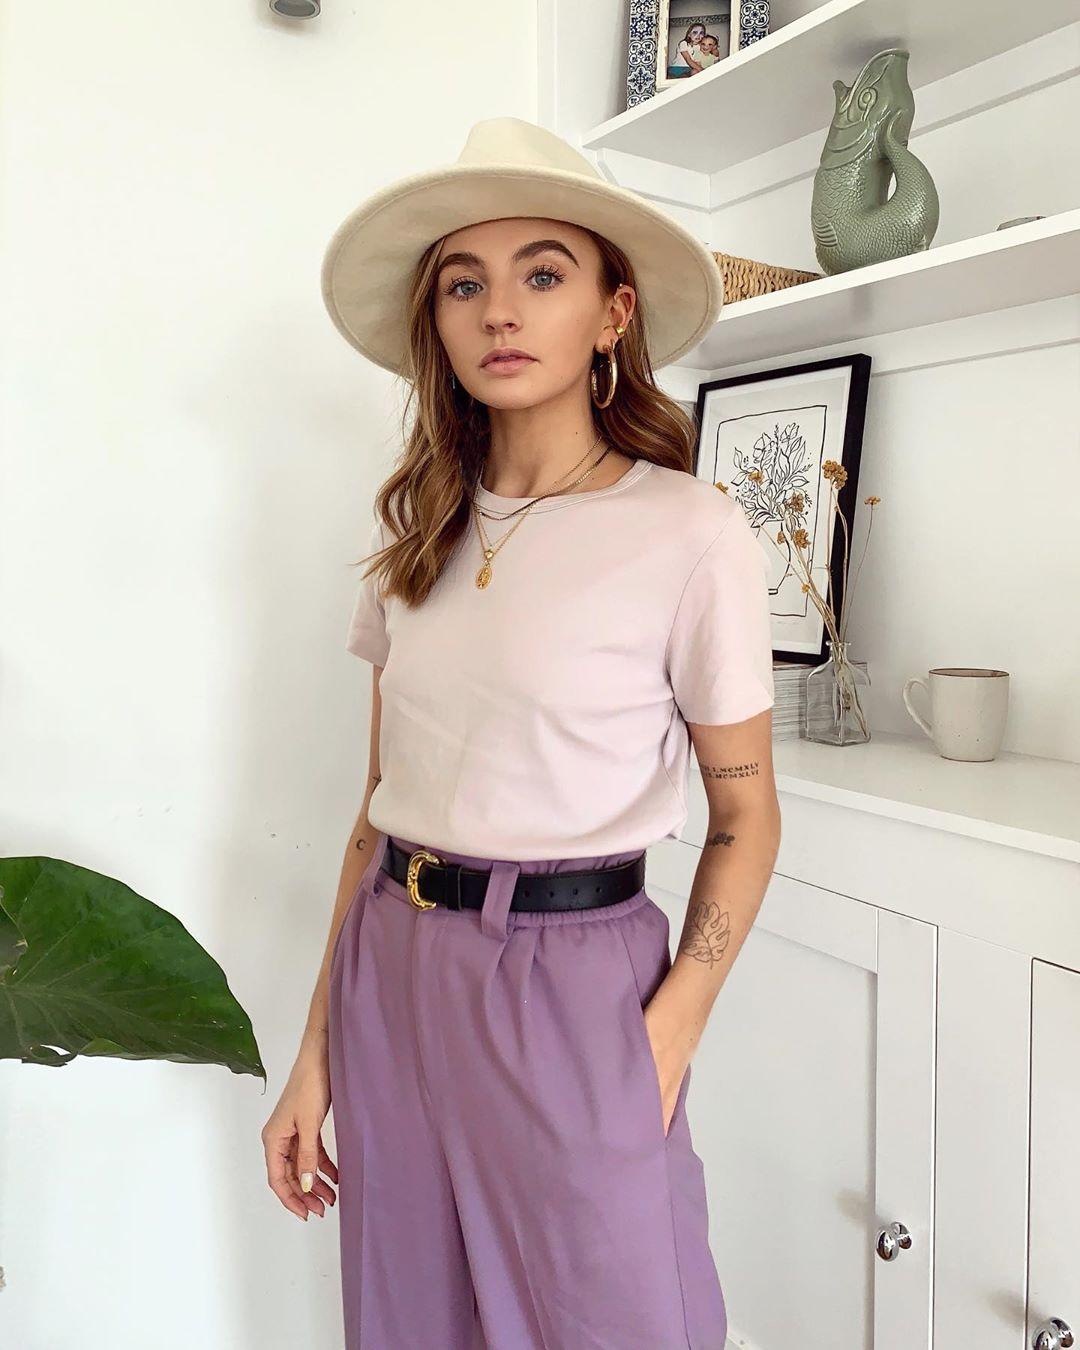 Chloe-Hayward-Wallpapers-Insta-Fit-Bio-3